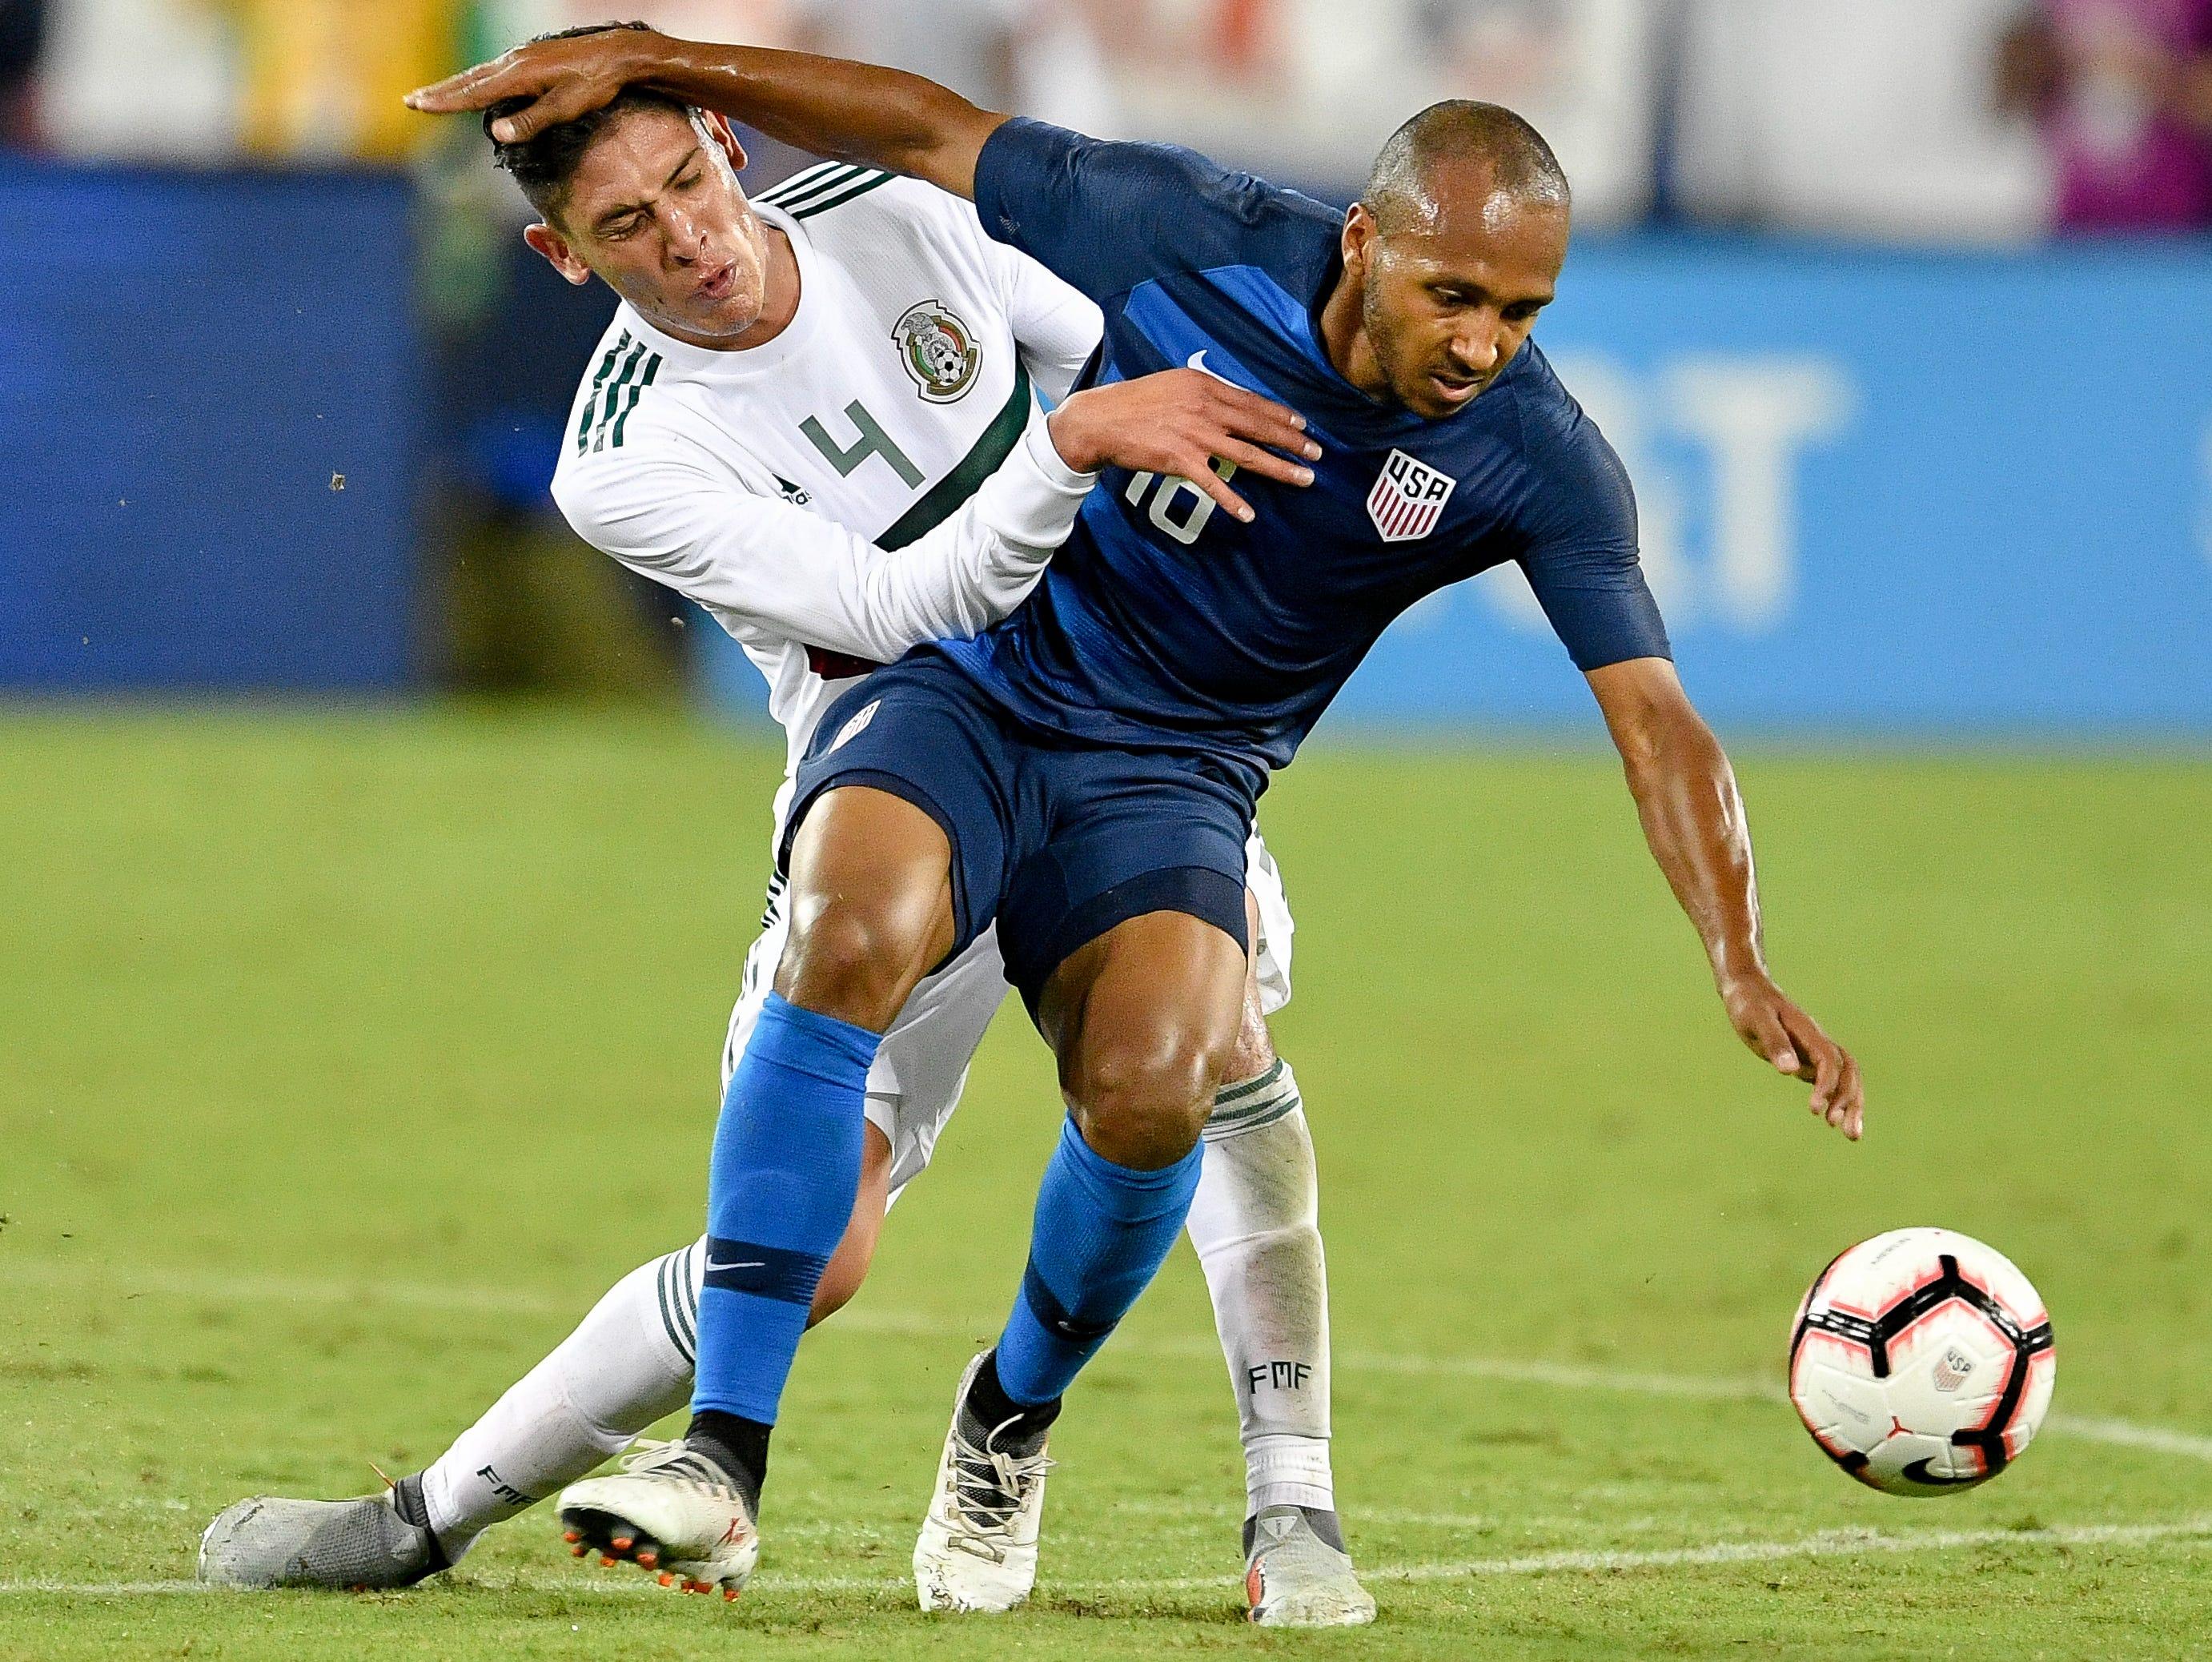 USA midfielder Julian Green (16) battles Mexico defender Edson Alvarez (4) during the second half at Nissan Stadium in Nashville, Tenn., Tuesday, Sept. 11, 2018.